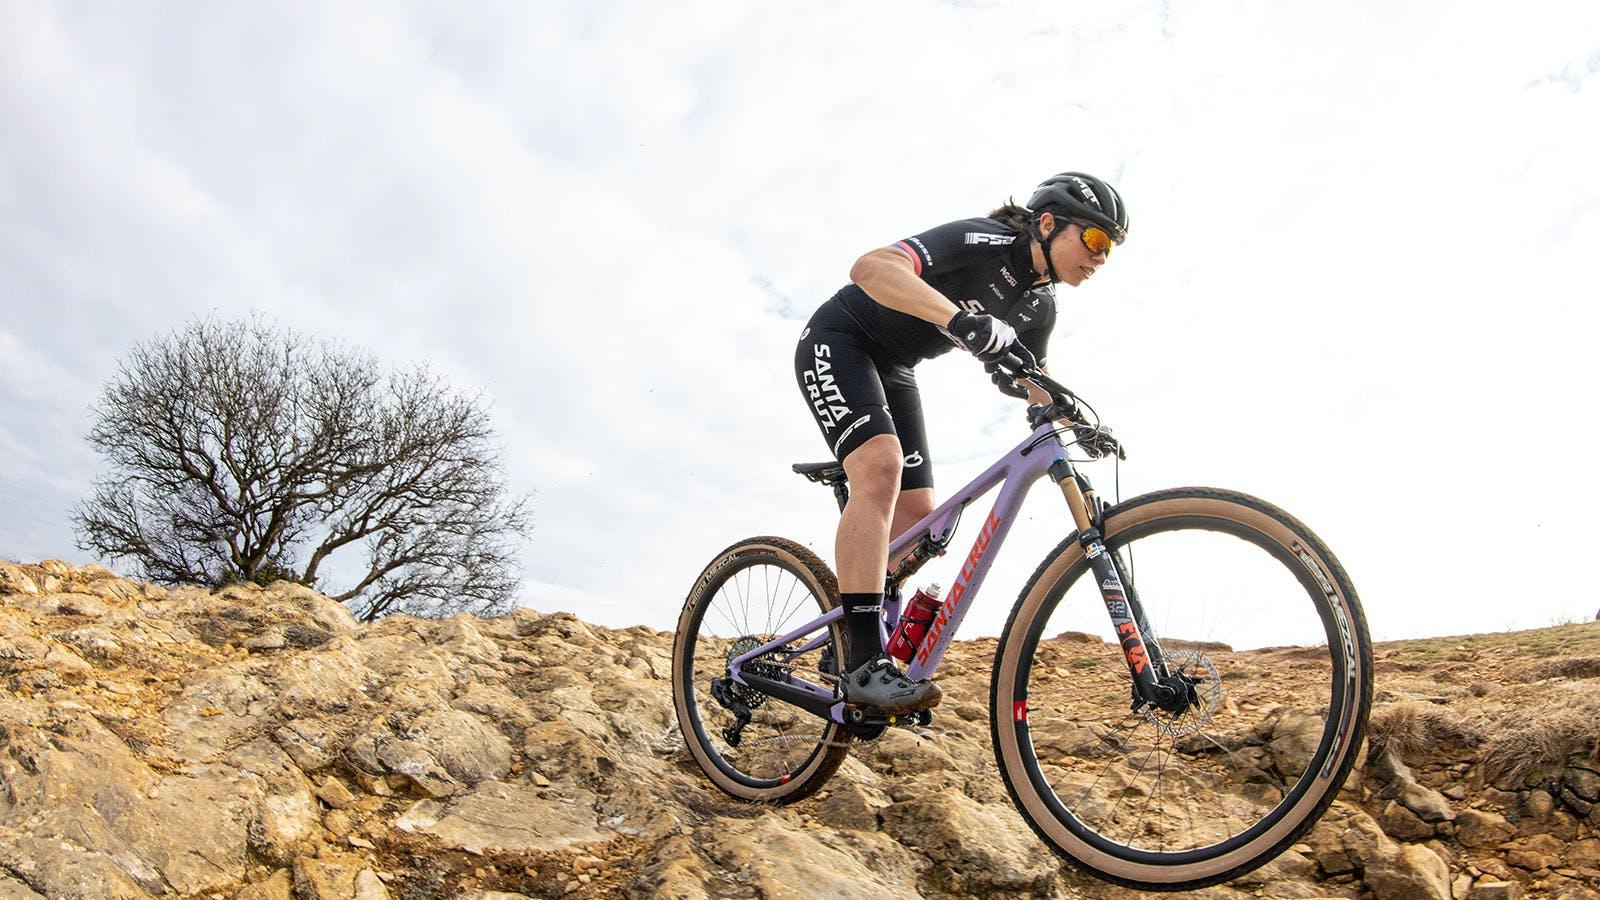 Martina Berta riding her purple Blur xc bike